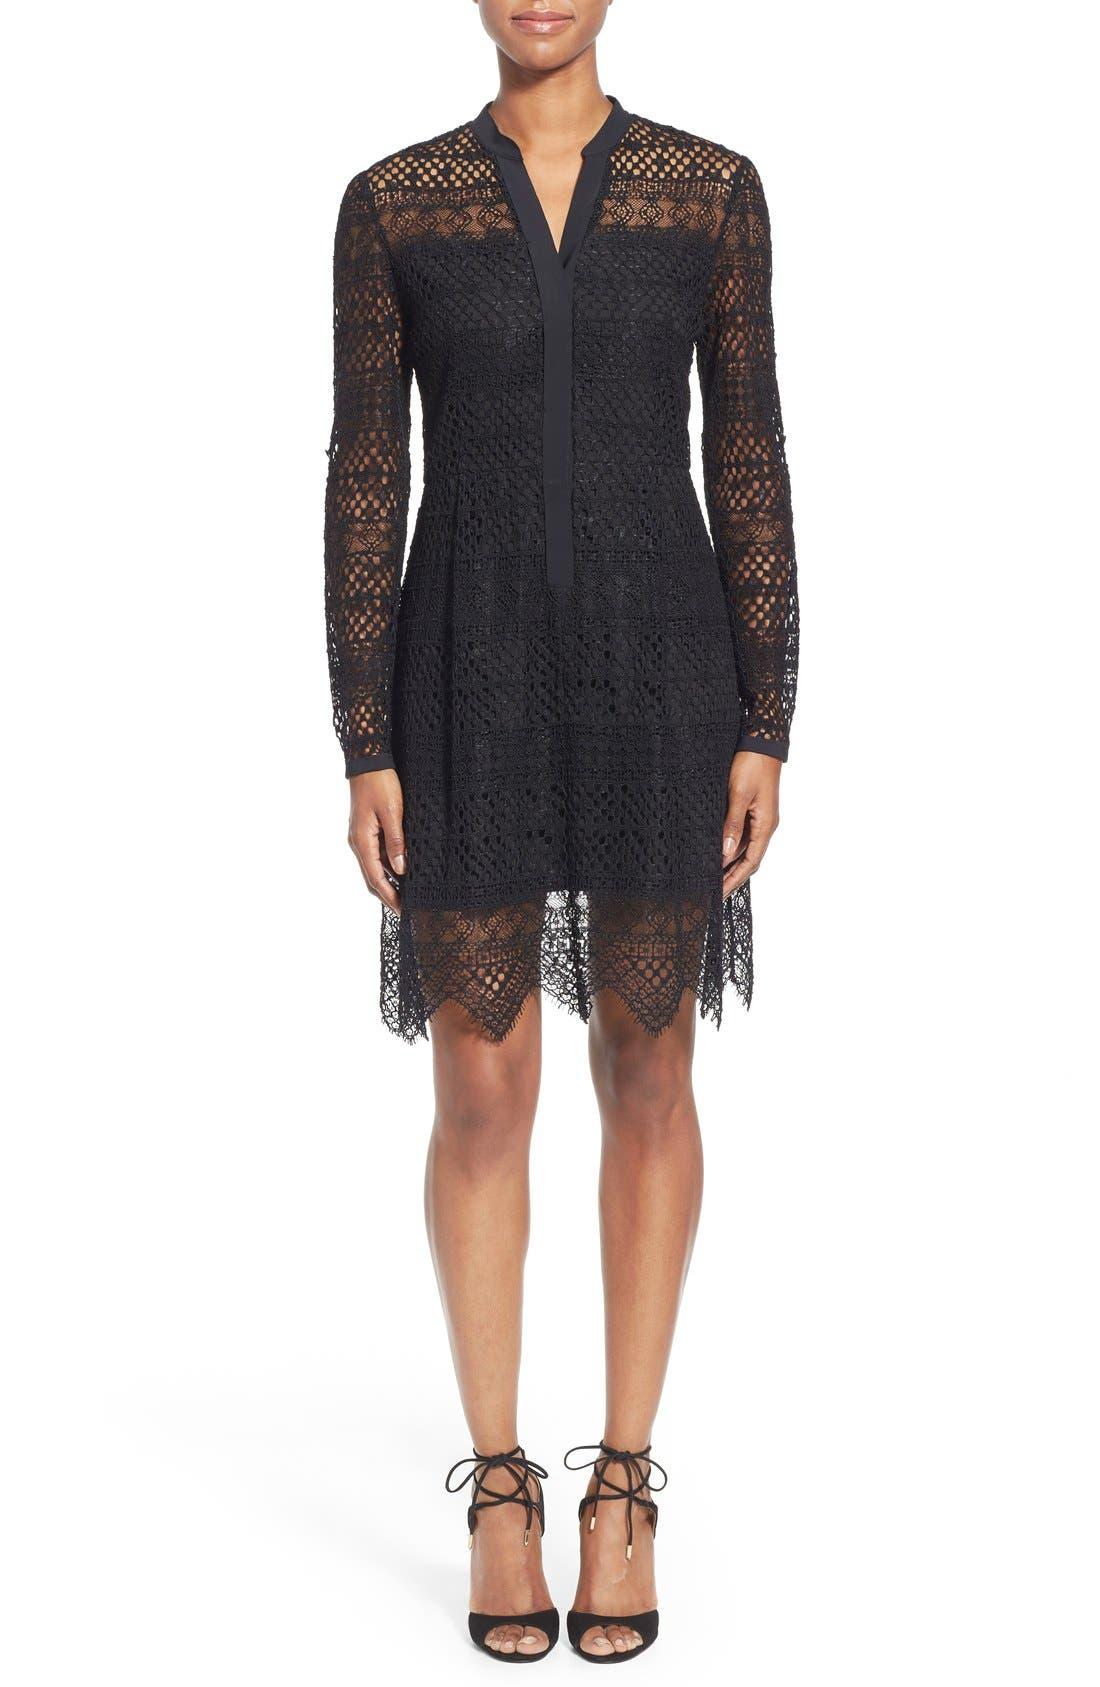 TAHARI Elie Tahari 'Whitney' Split Neck Lace Sheath Dress, Main, color, 001